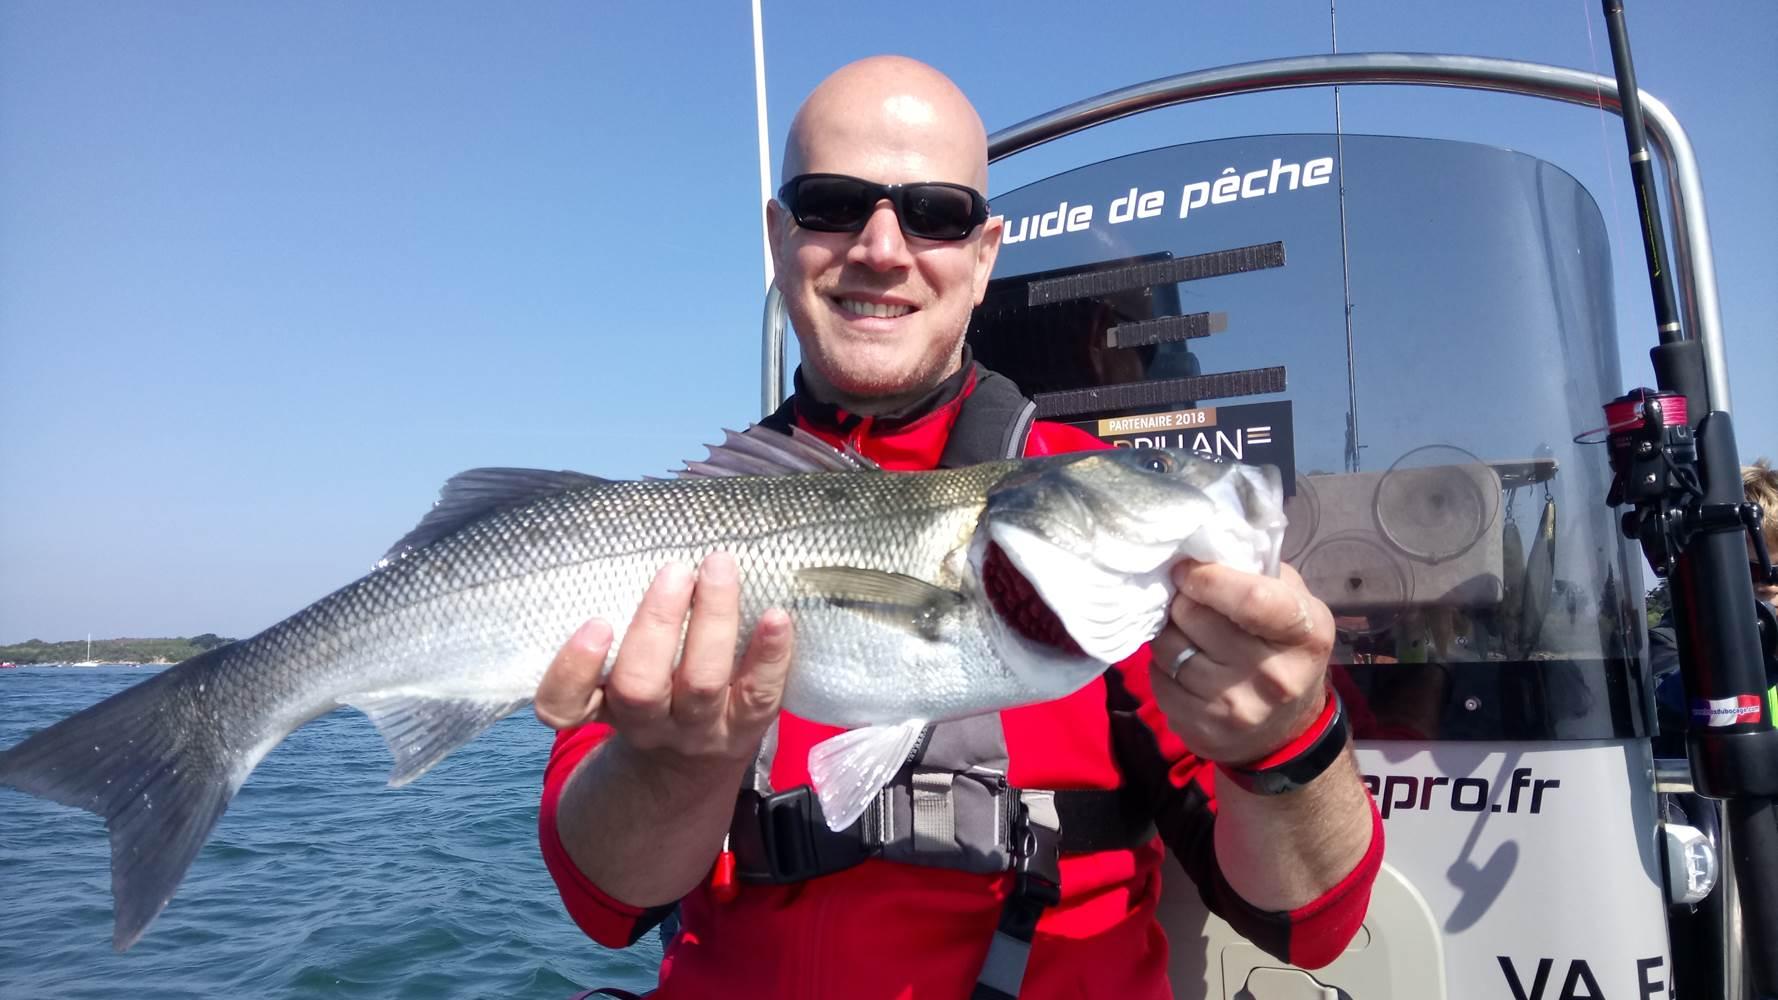 Guide de peche Morbihan - Sortie peche en mer Sarzeau - Stage de peche en mer- Sortie pêche au bar - Guide de pêche Golfe du Morbihan ©